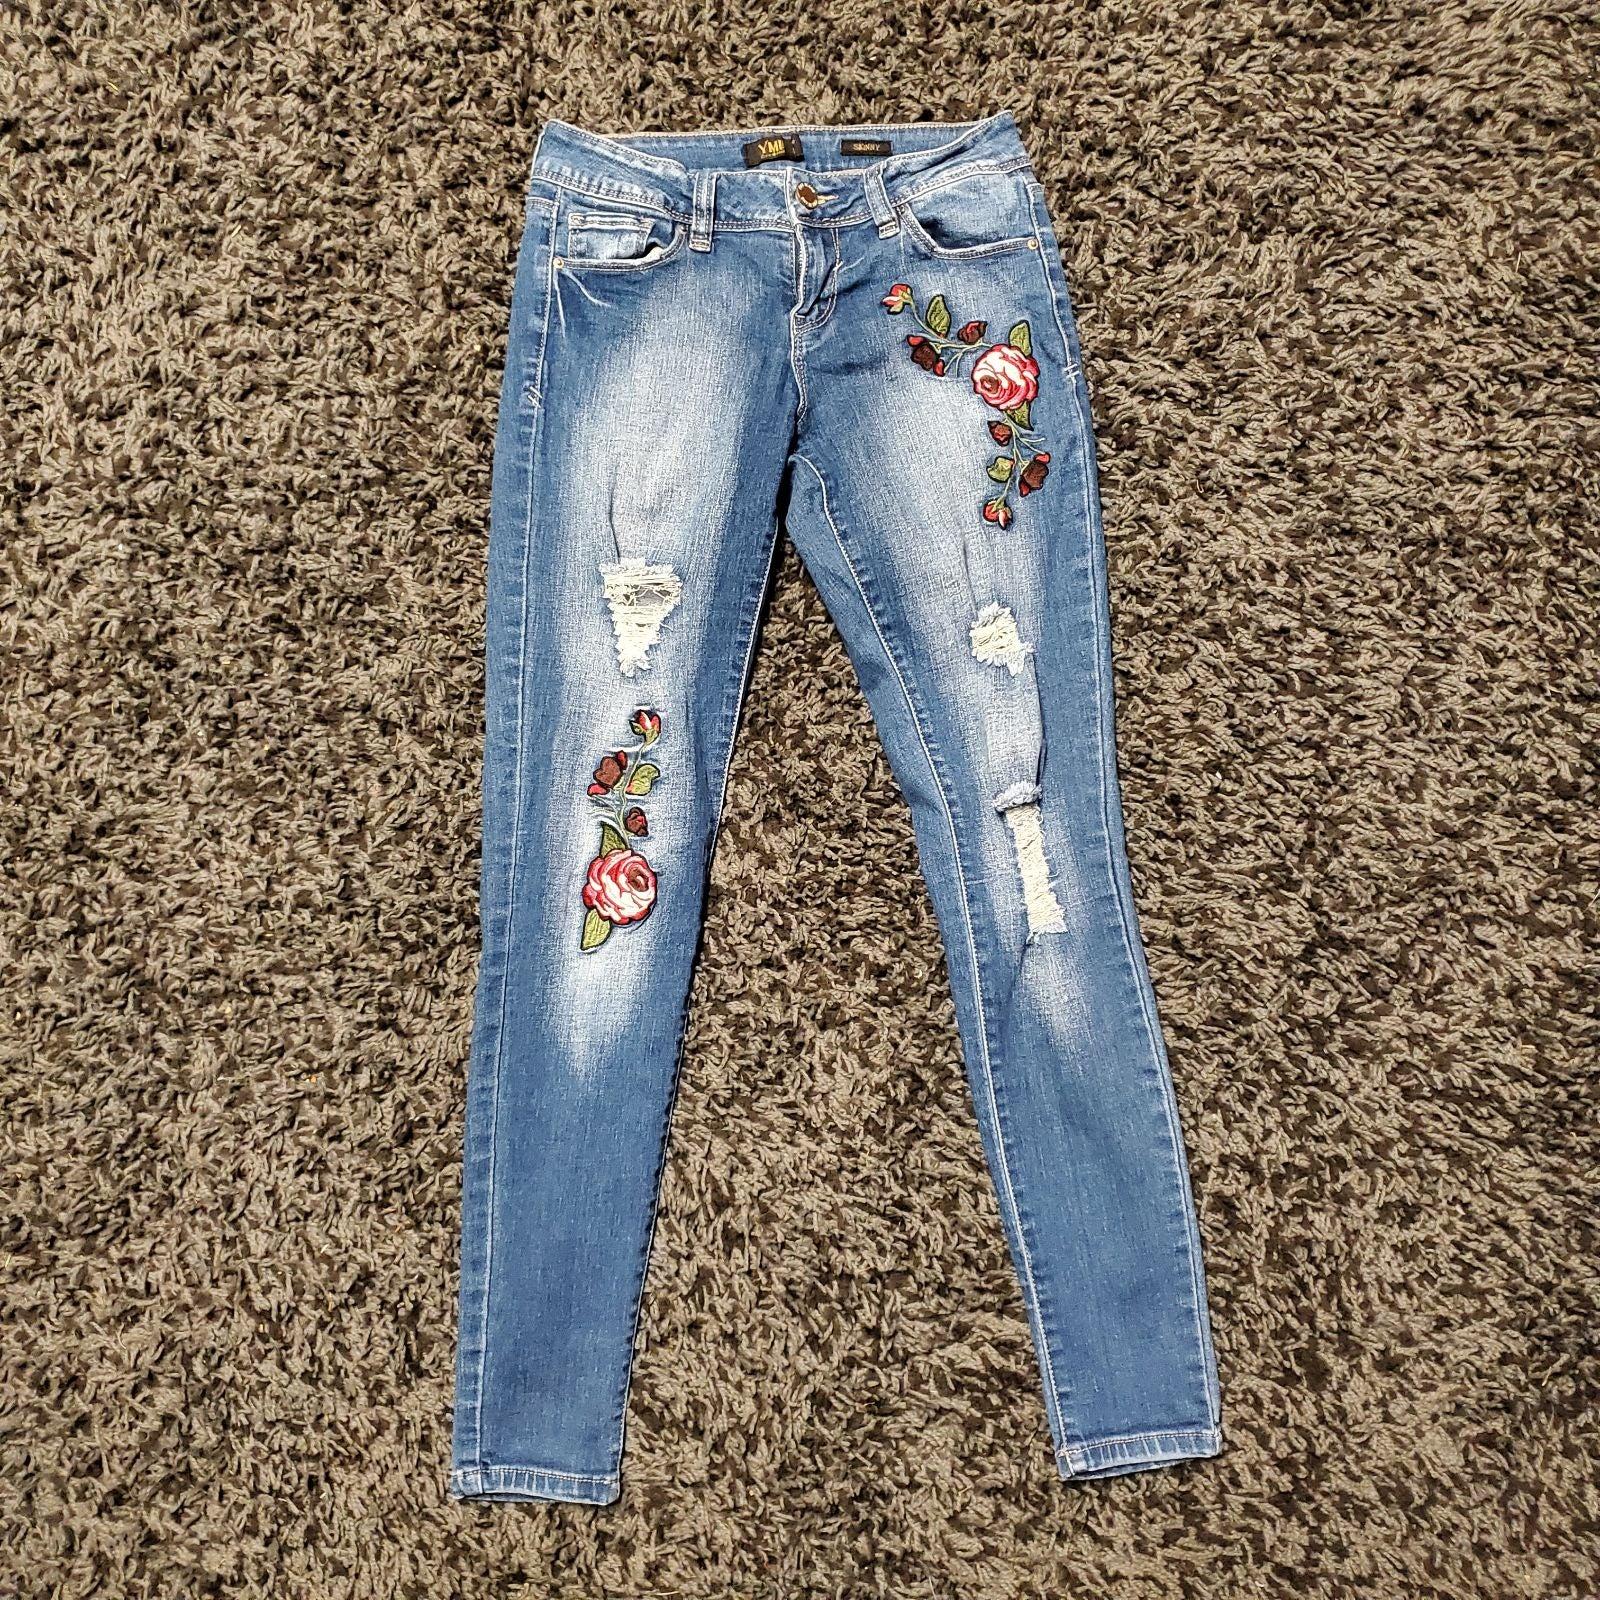 Size 3 YMI Rose Skinny Jeans